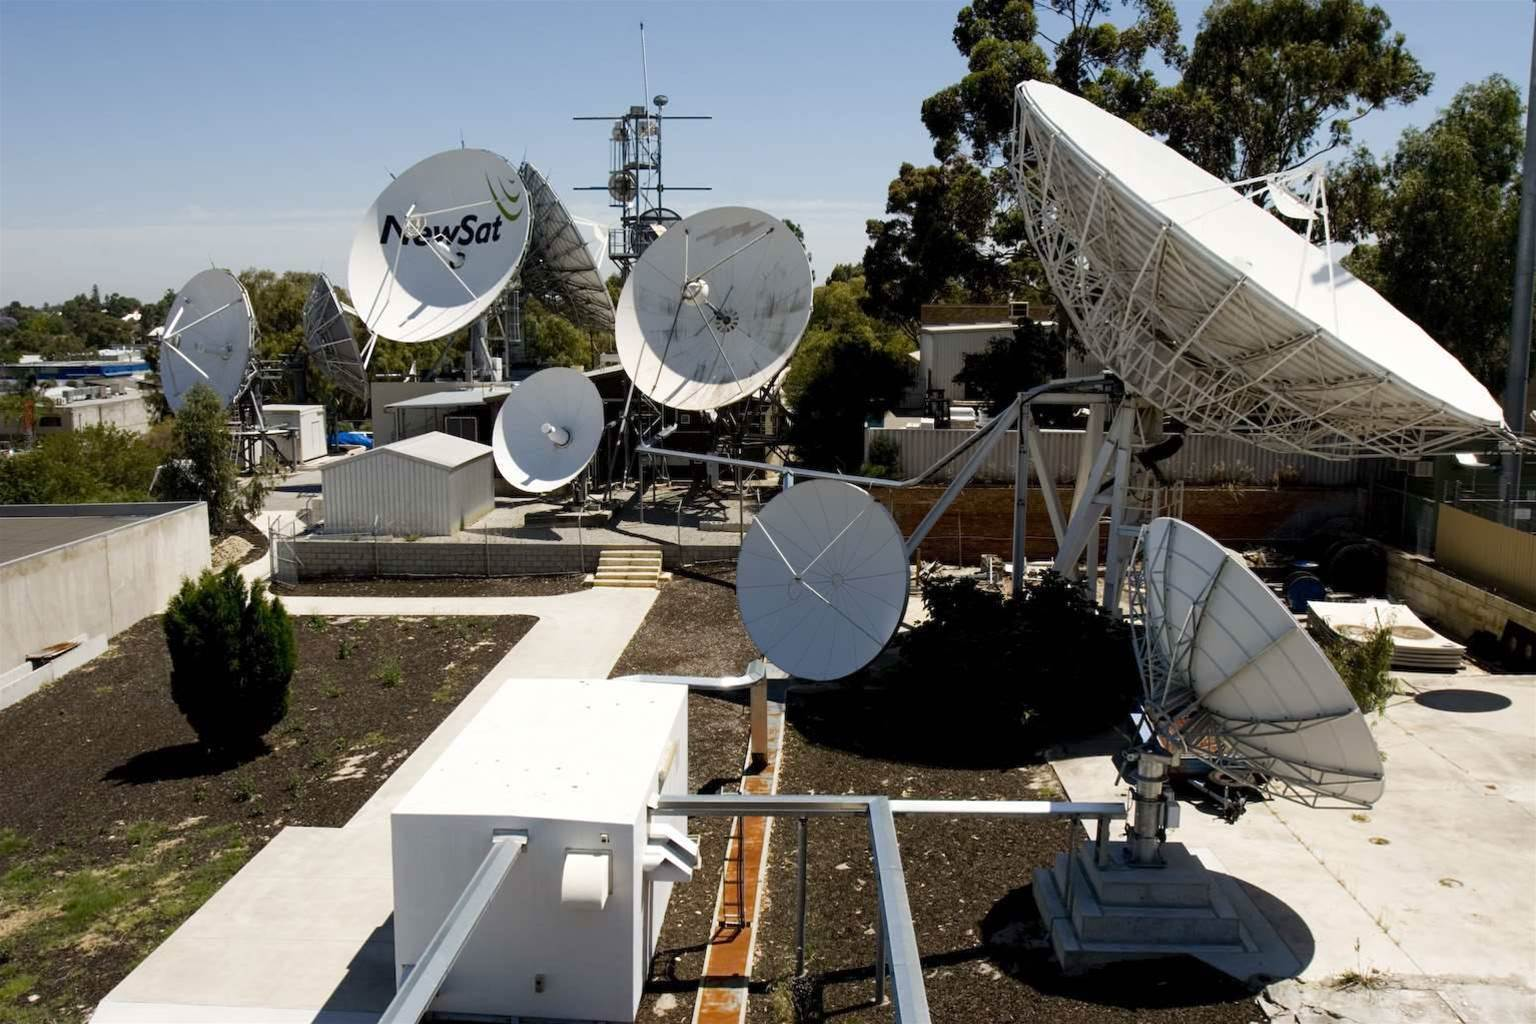 SpeedCast buys NewSat teleport sites for $12m